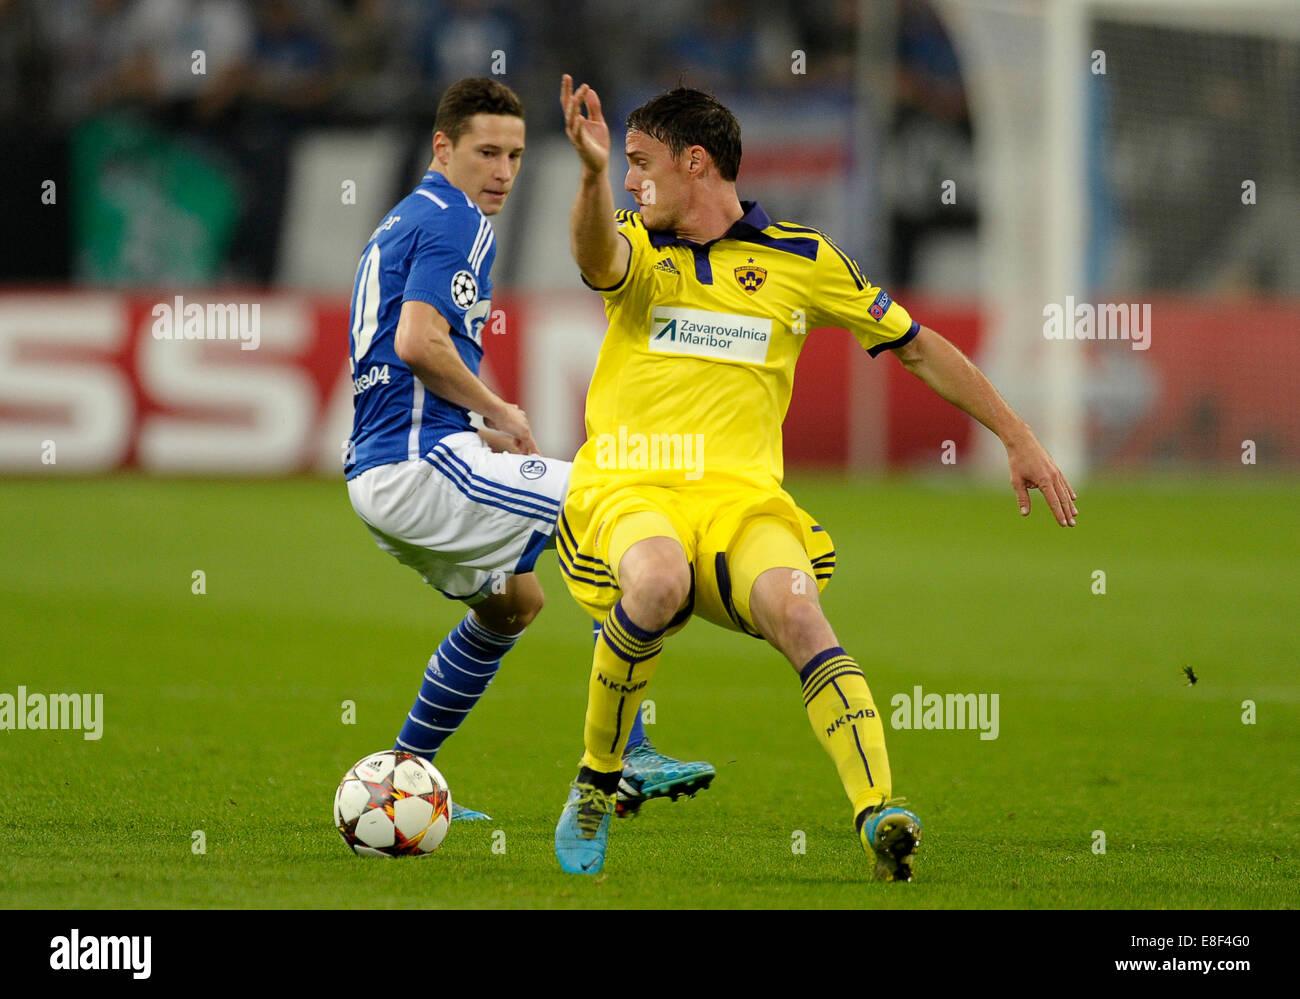 Gelsenkirchen, Deutschland 30.9.2014, Gruppenphase der Championsleague 14/15, Schalke 04 - NK Maribor - Julian Draxler Stockbild